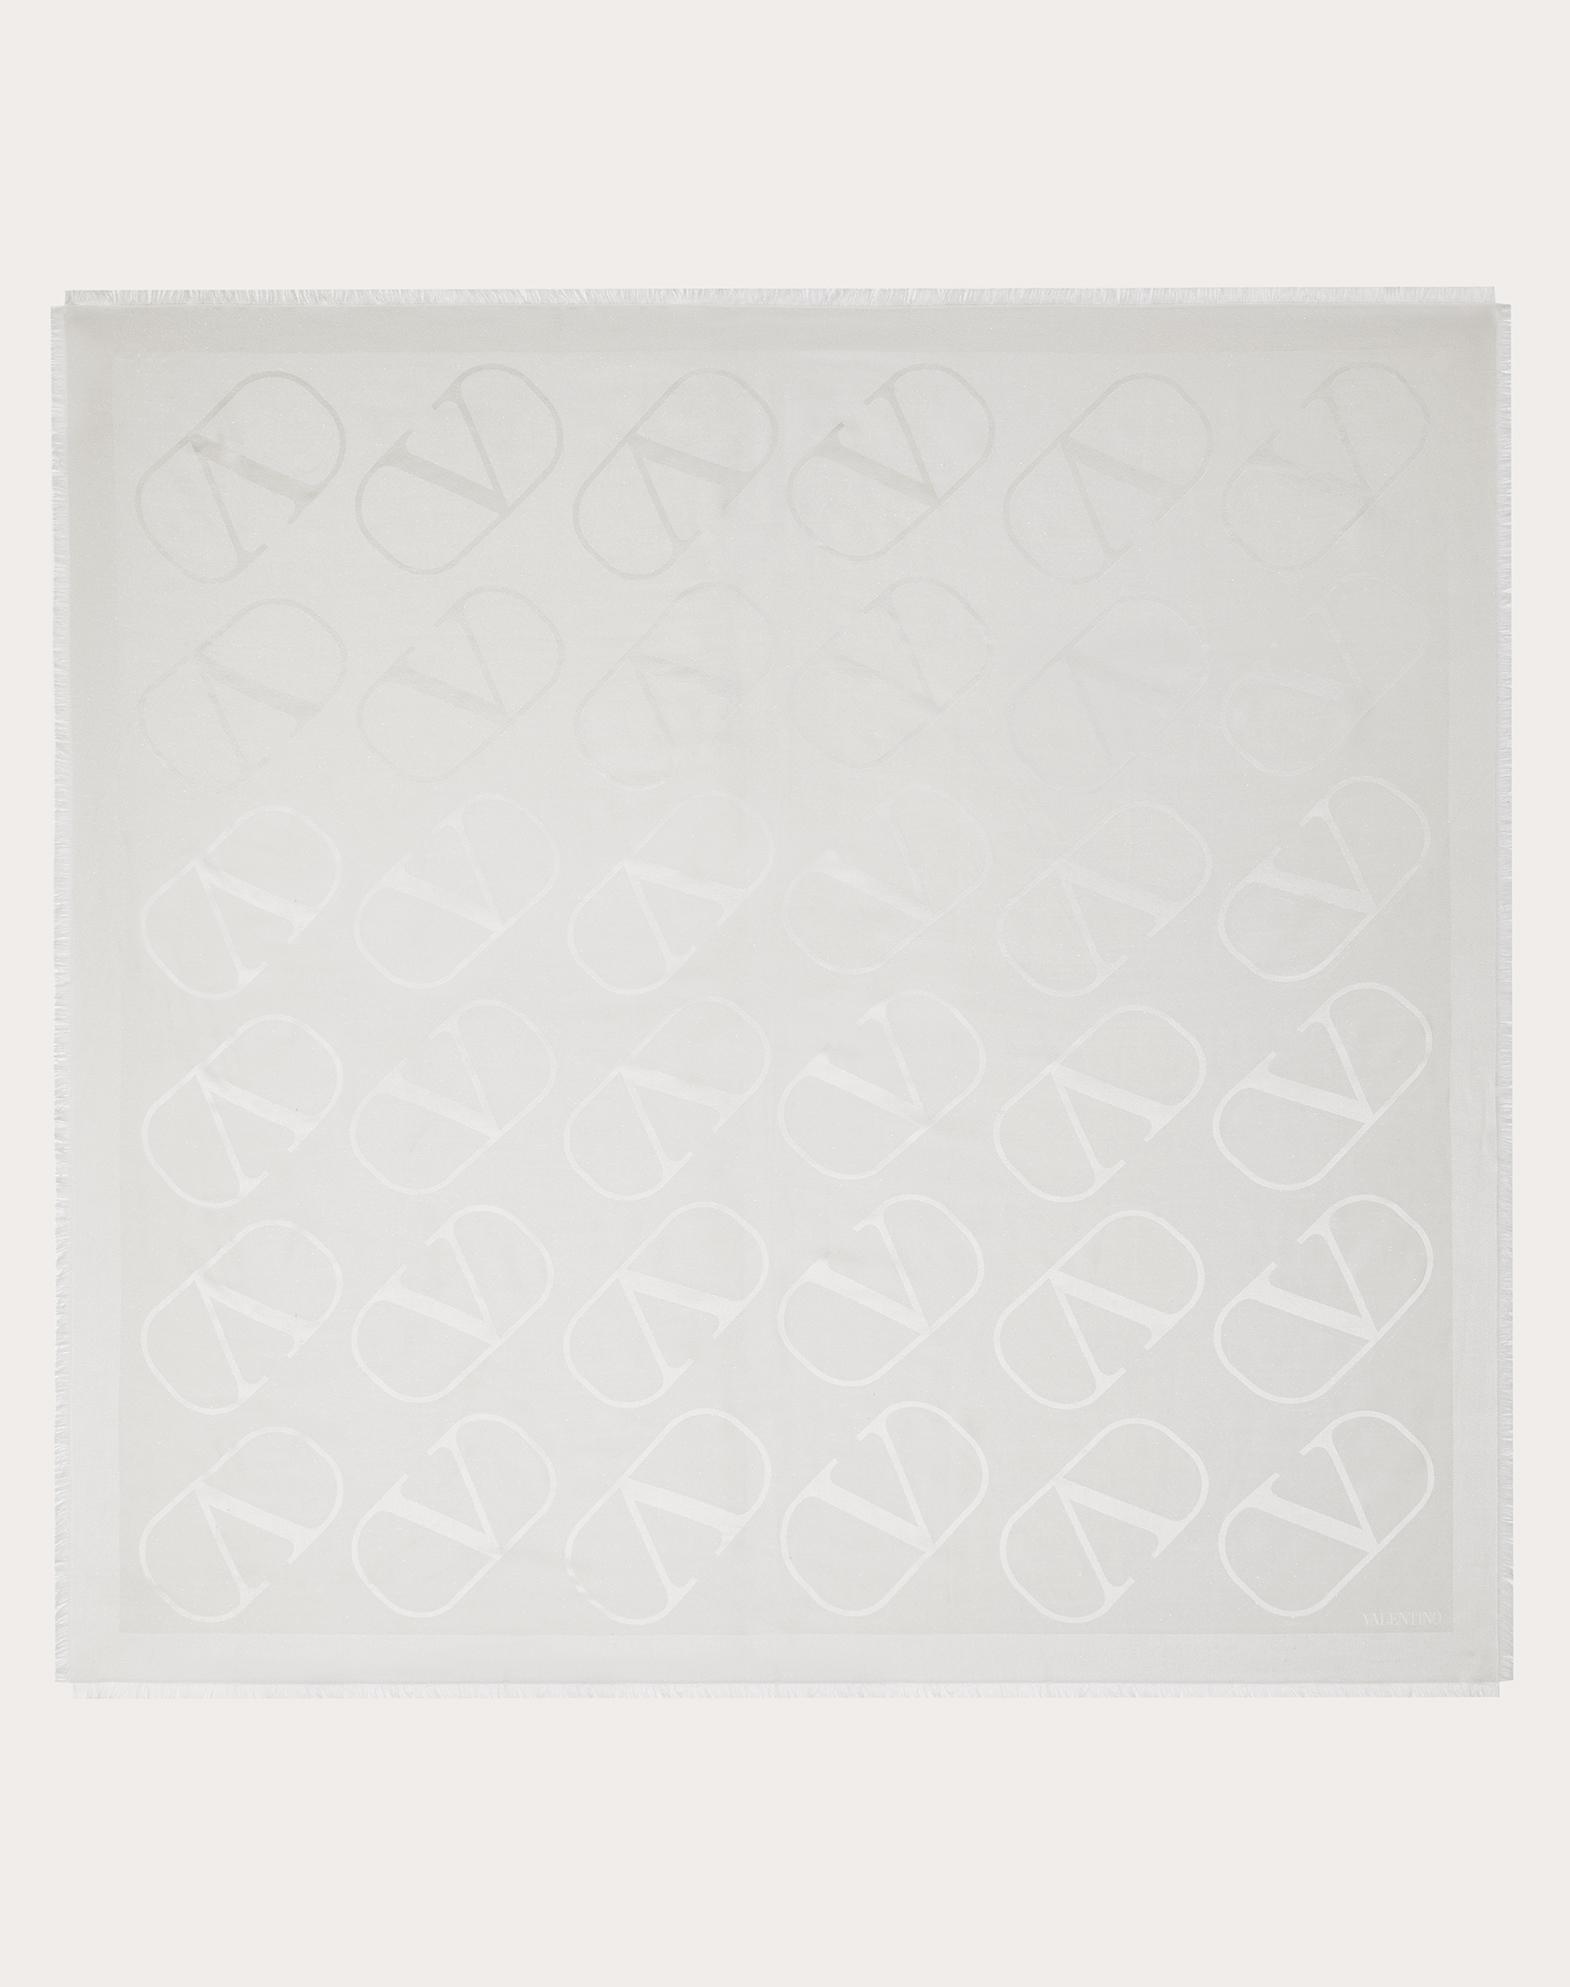 VLOGO shawl with lurex 140x140 cm / 55.1x55.1 in.